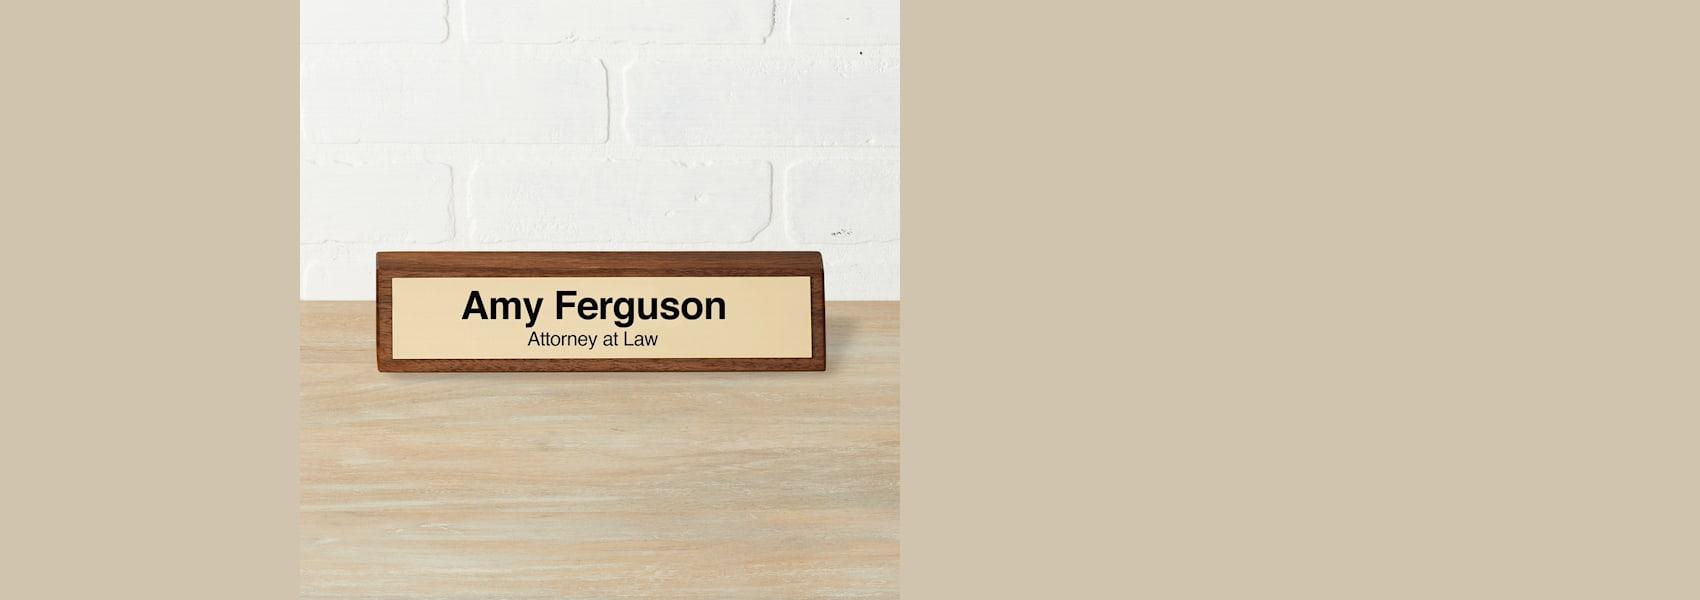 custom desk name plates